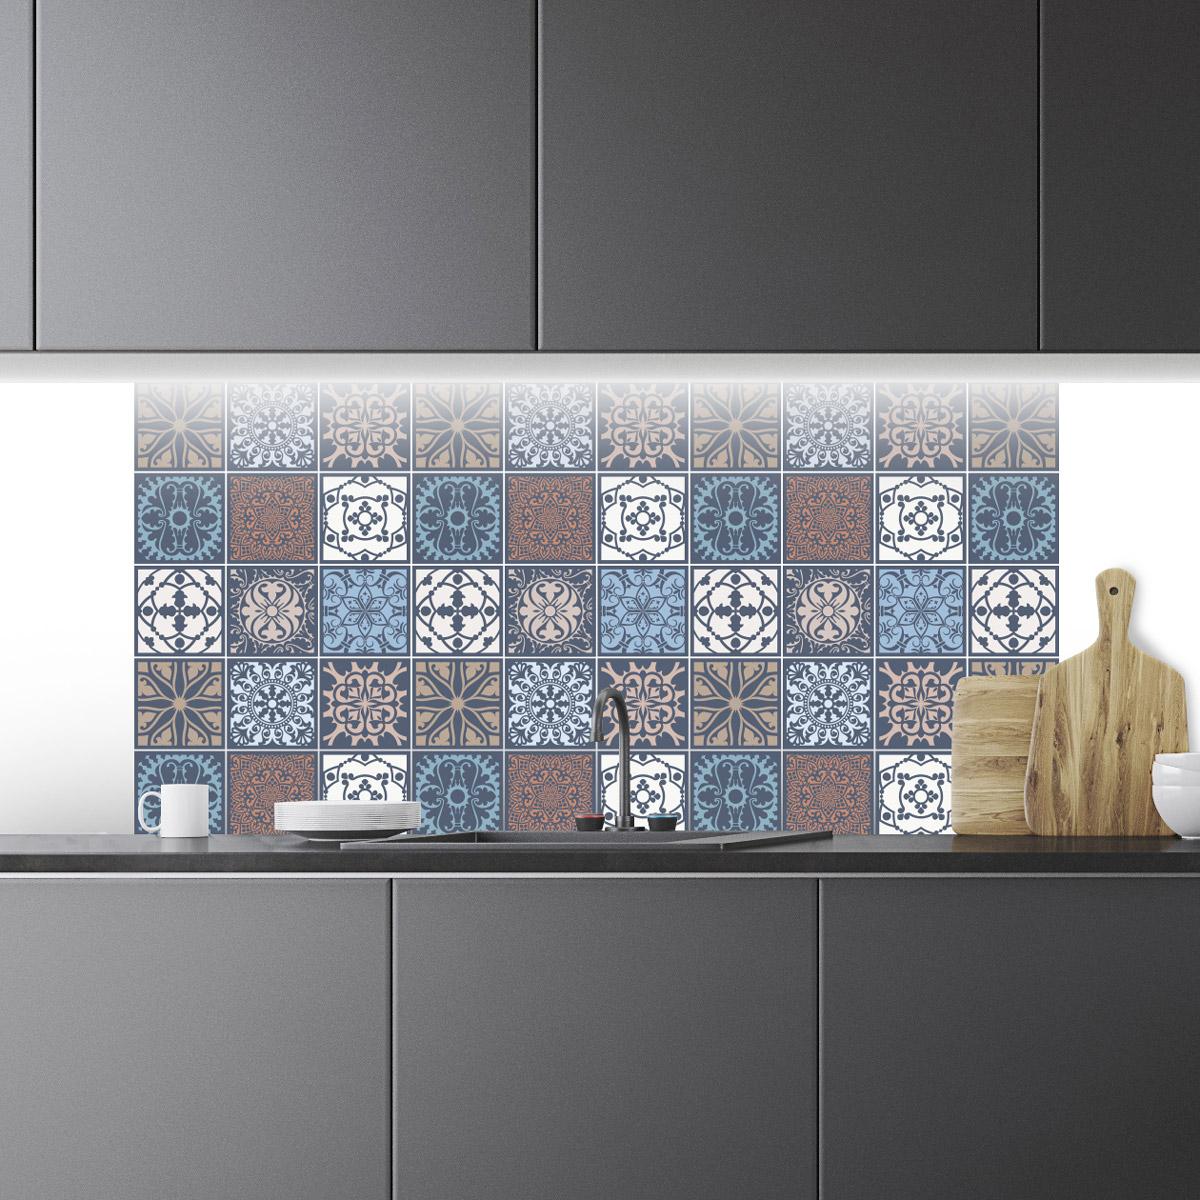 60 stickers carrelages azulejos ornements artistique art et design artistiques ambiance sticker. Black Bedroom Furniture Sets. Home Design Ideas